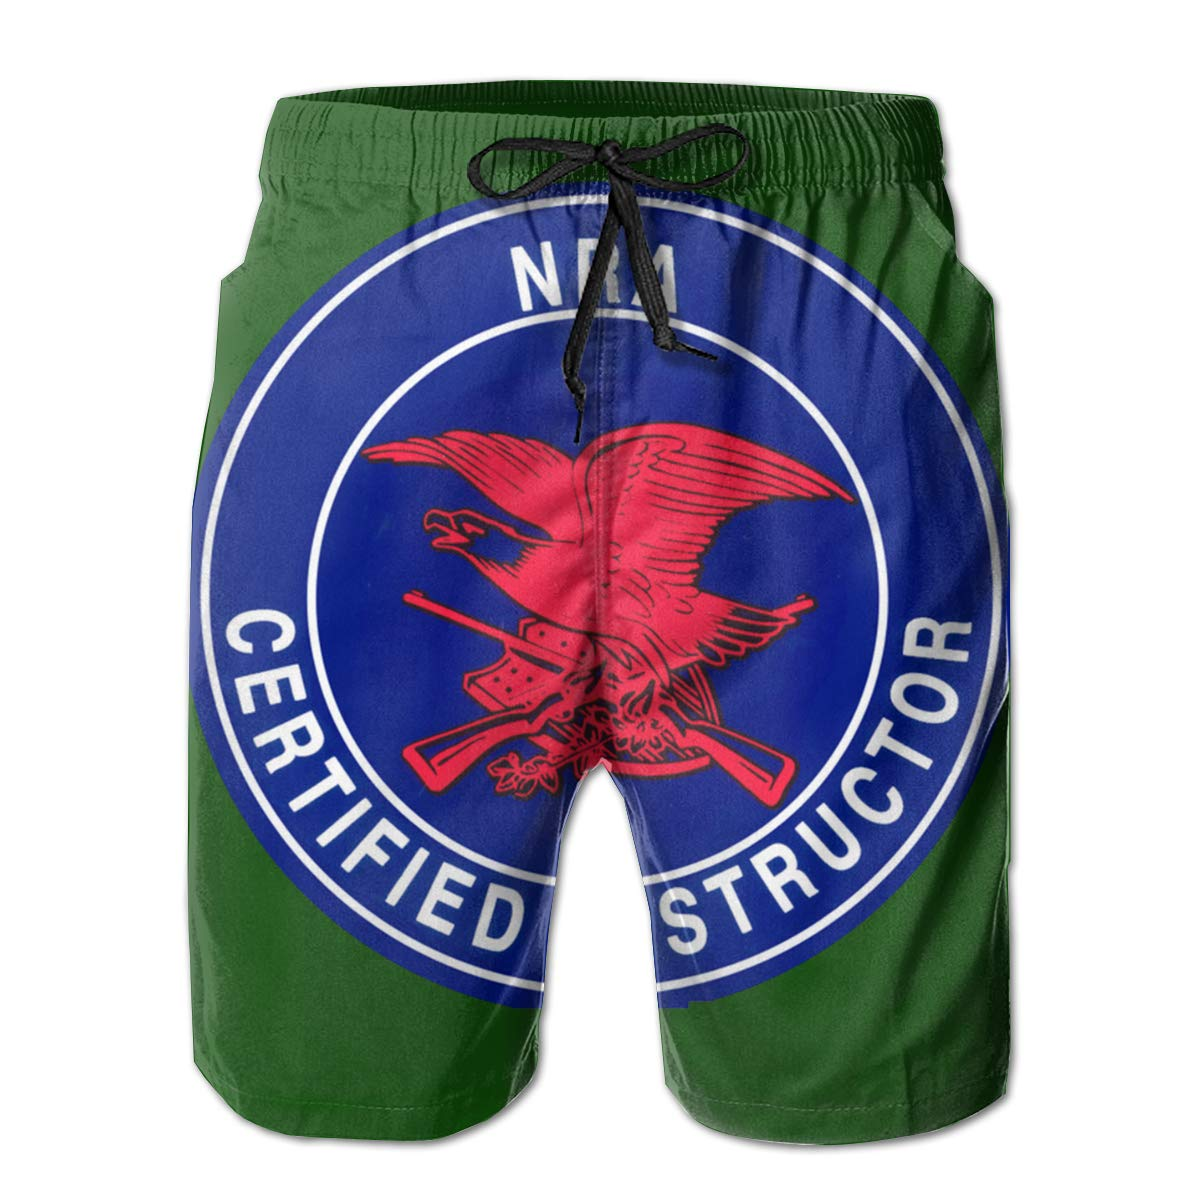 QKQ77 KK7 NRA Certified Instructor Mens Board Shorts,Casual Shorts,Beach Shorts Summer Boardshorts